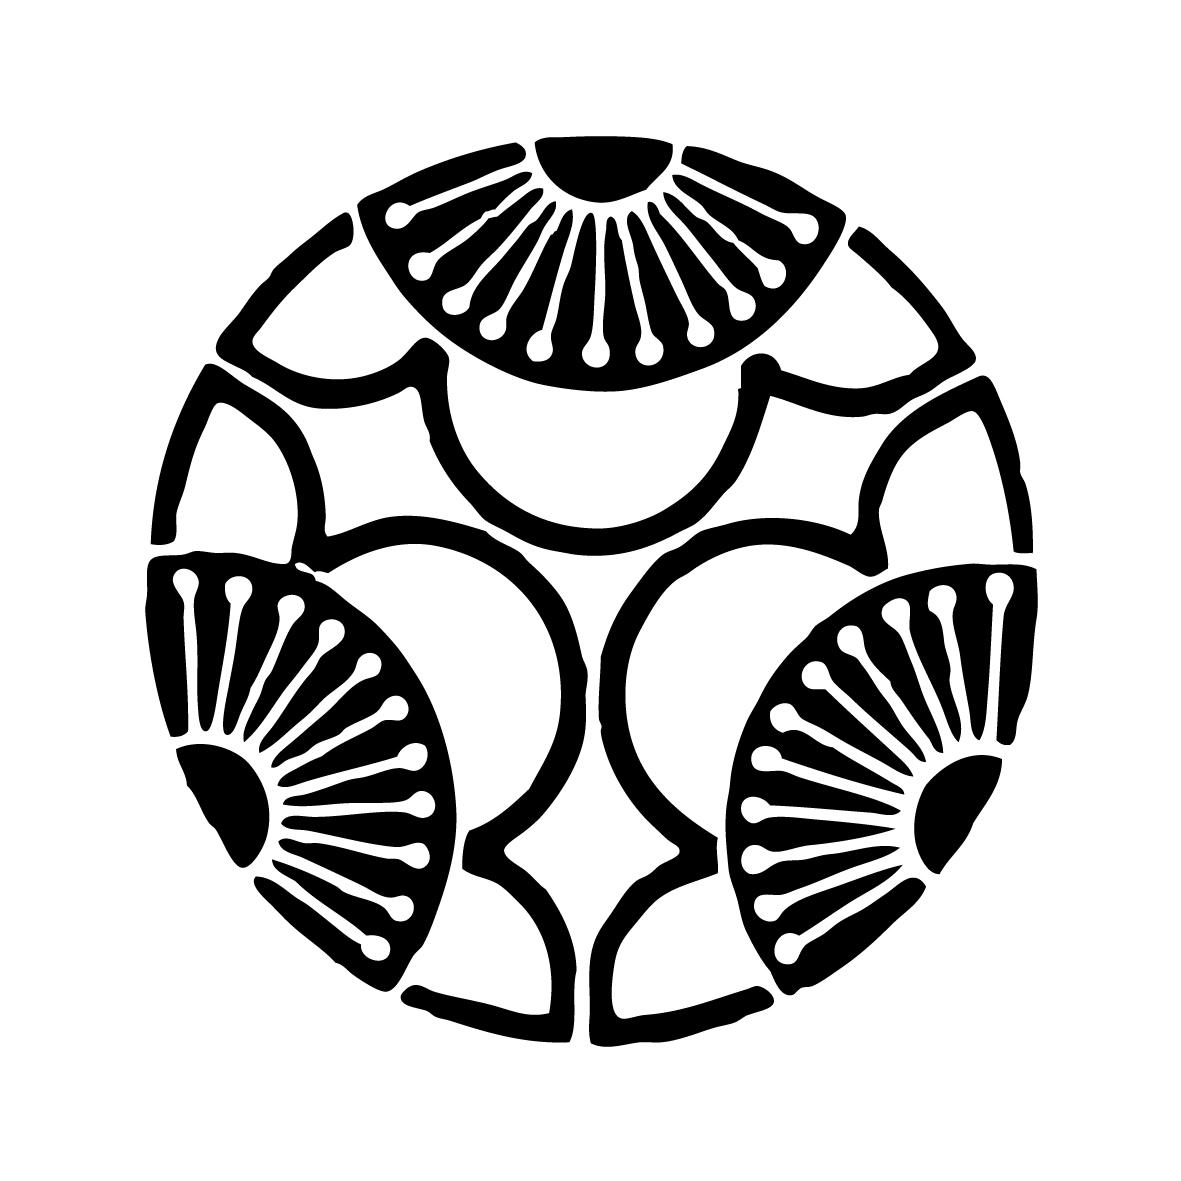 Tribal clipart circular Free Tattoo Circle Design on